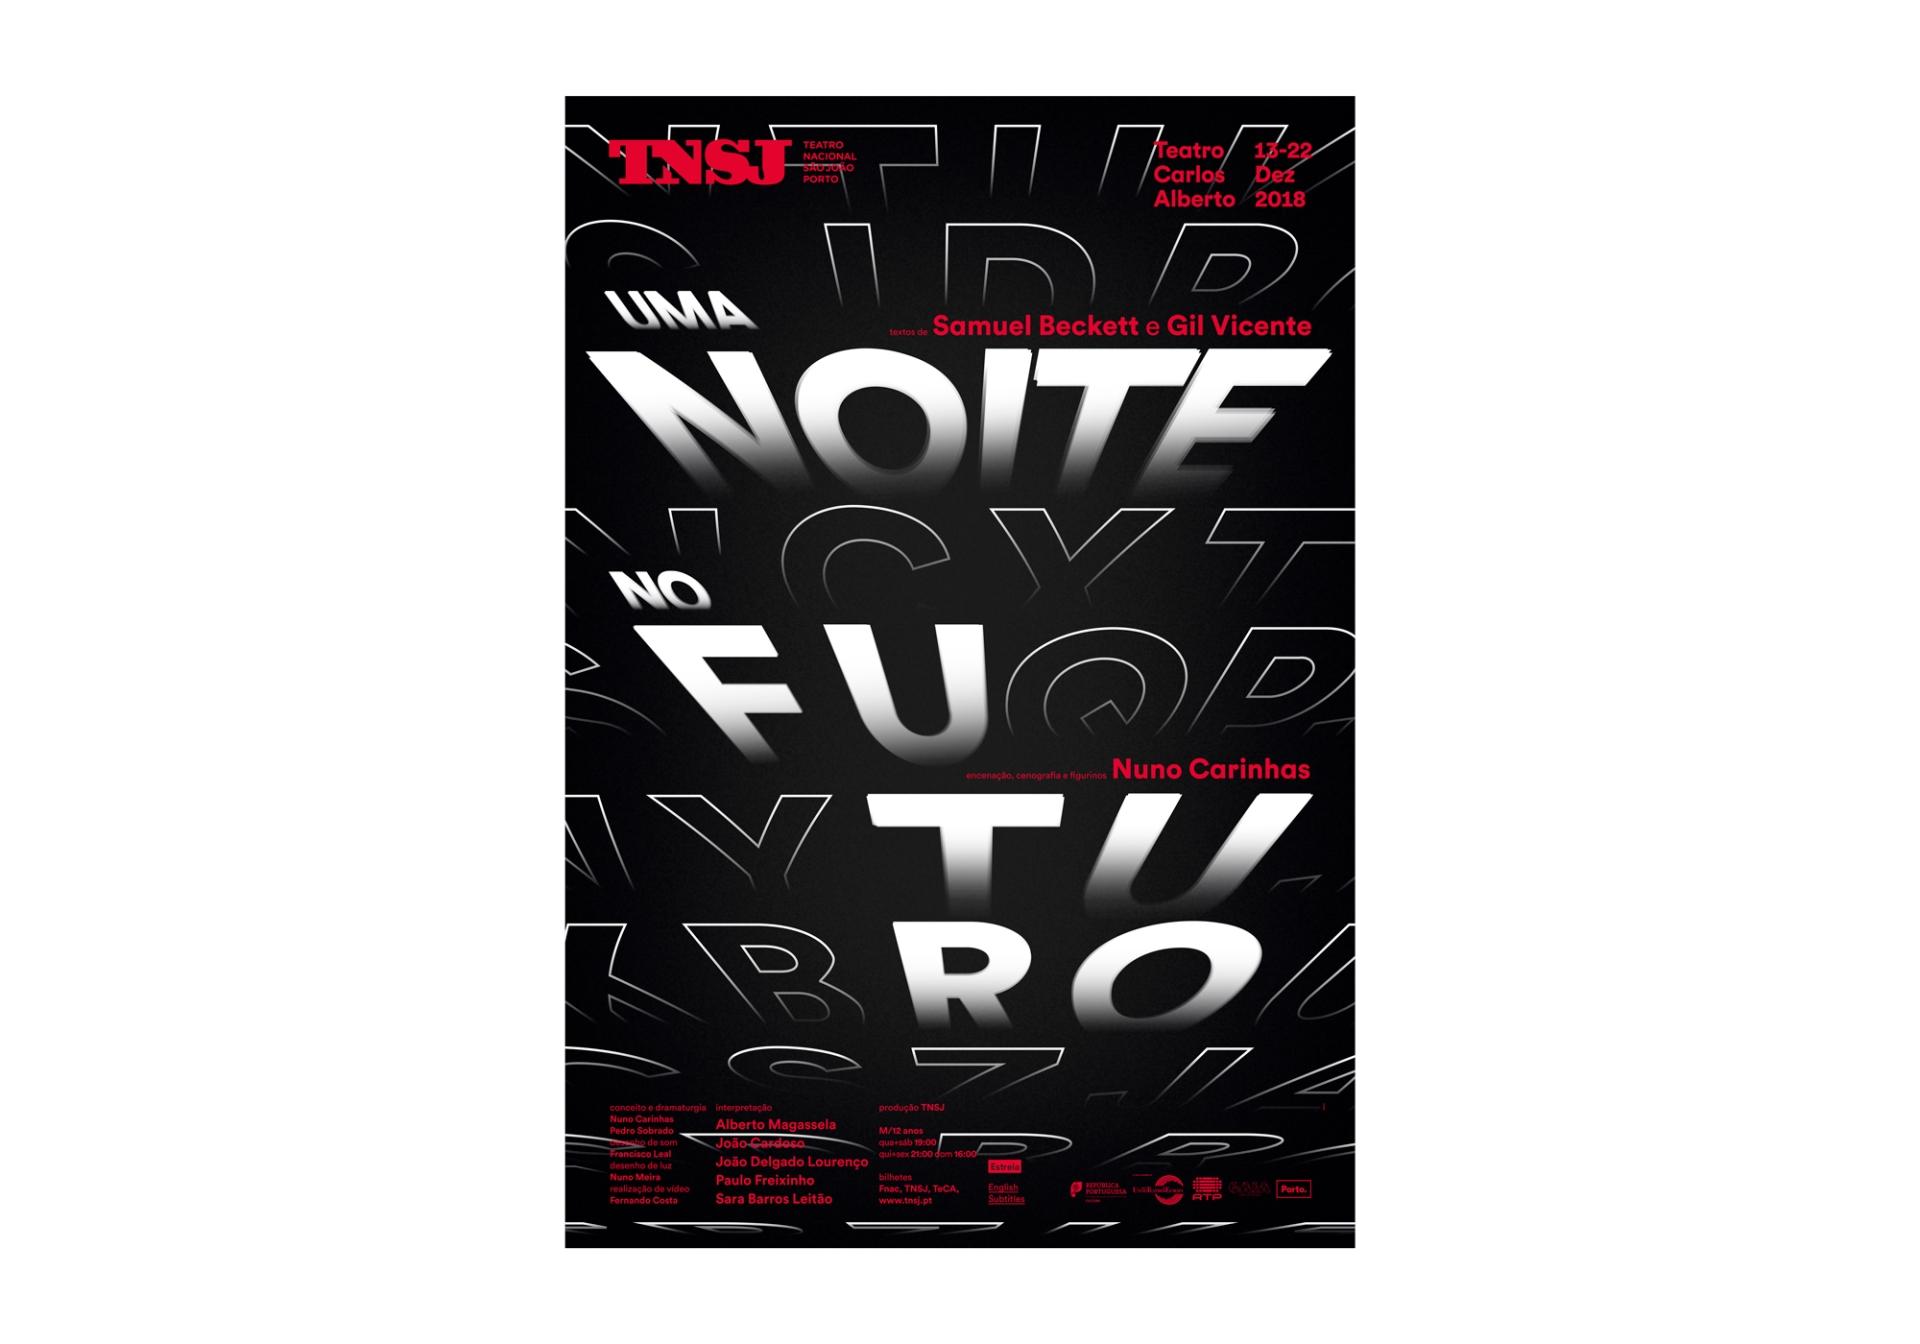 São João National Theatre Posters 2017-2018 Image:2 dobra-tnsj-Futuro-07